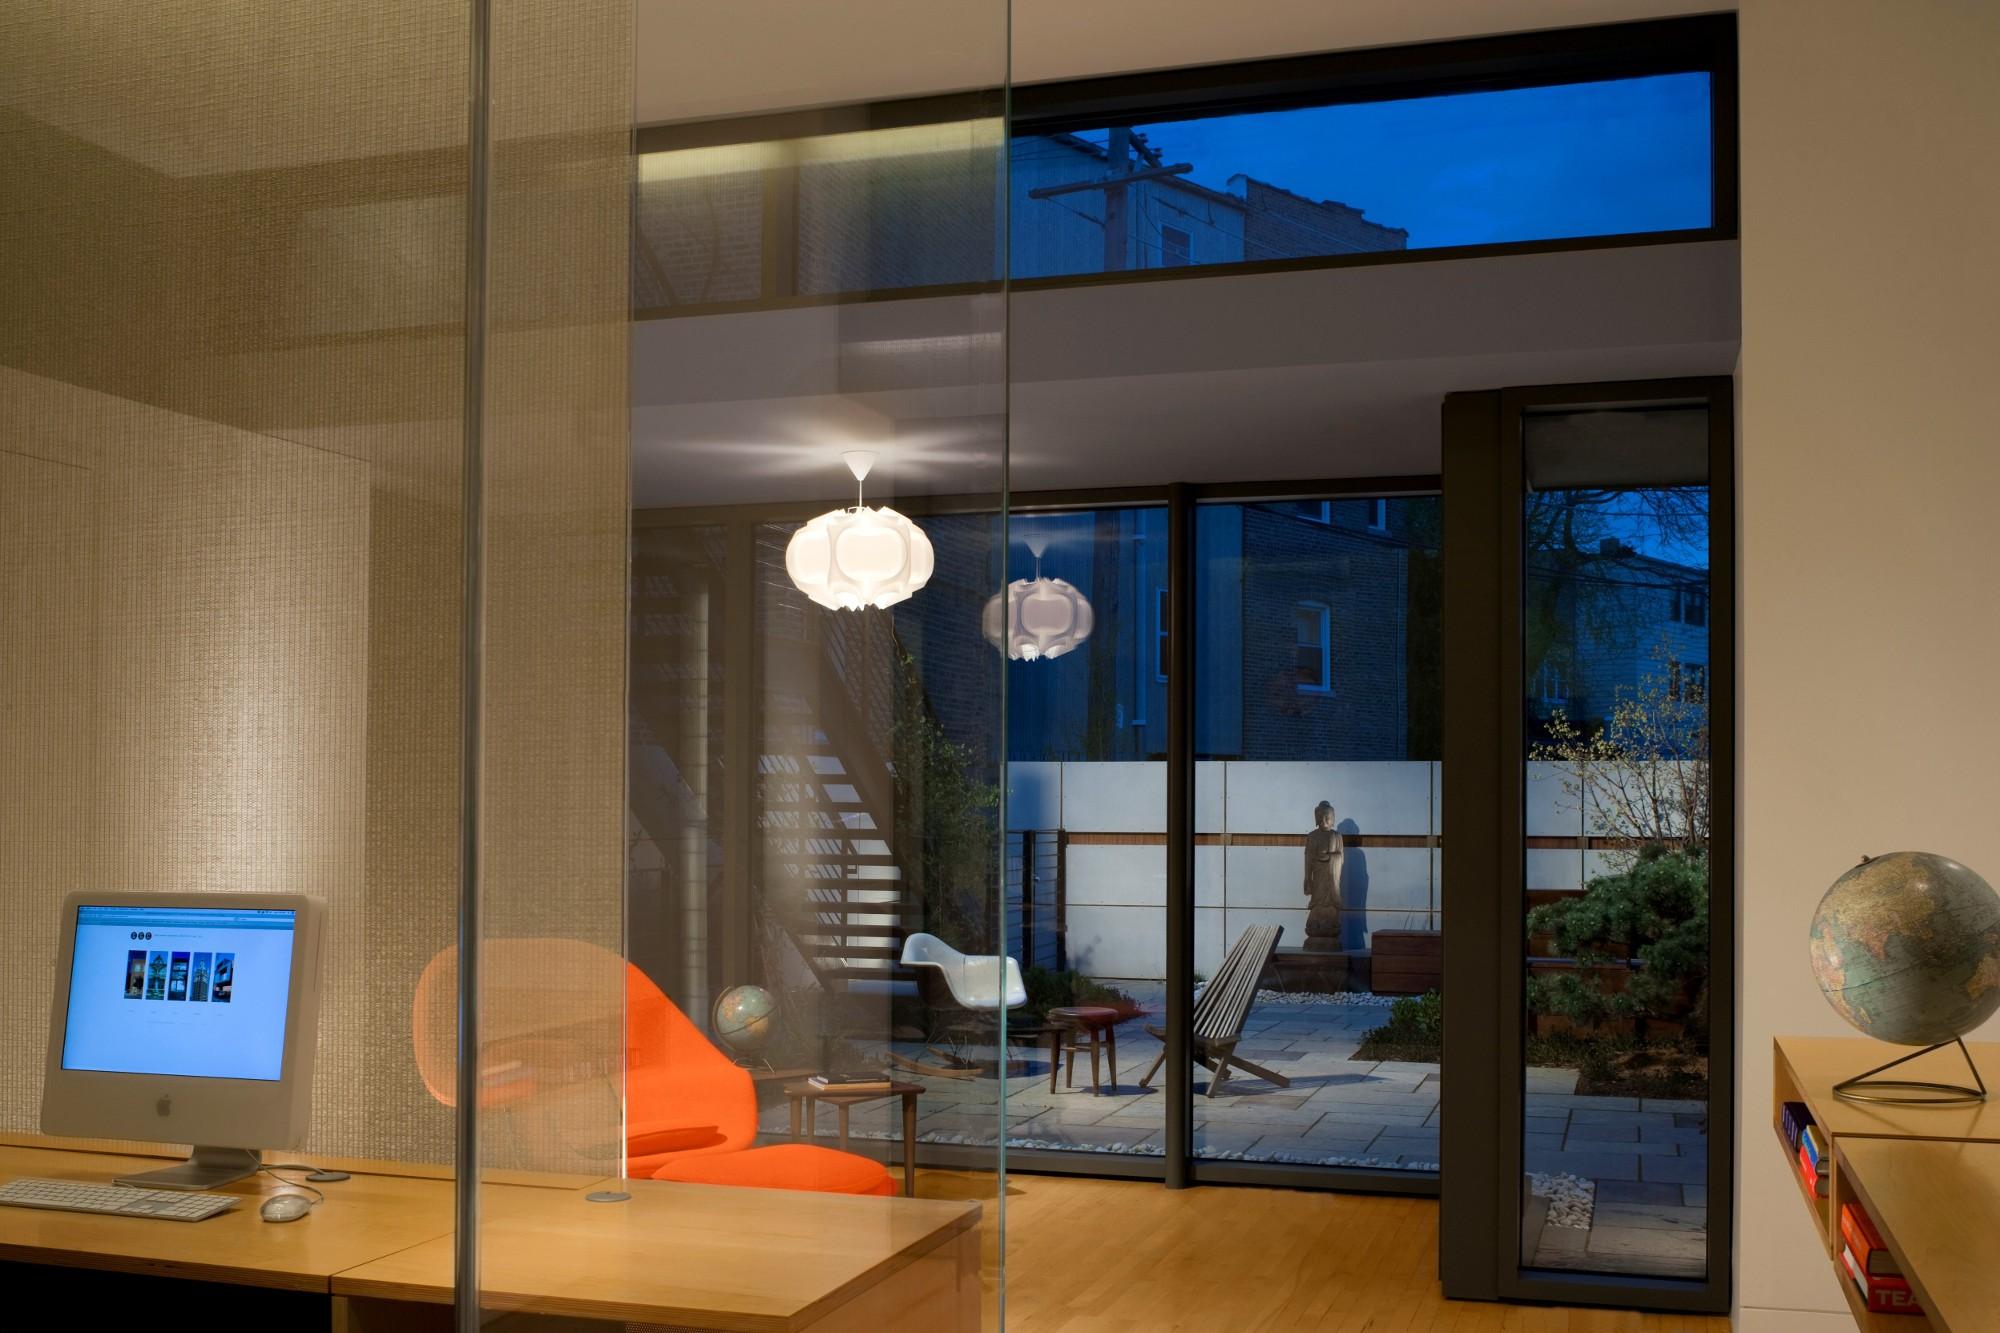 Studio V Design Krause Music Store Sites Open House Chicago